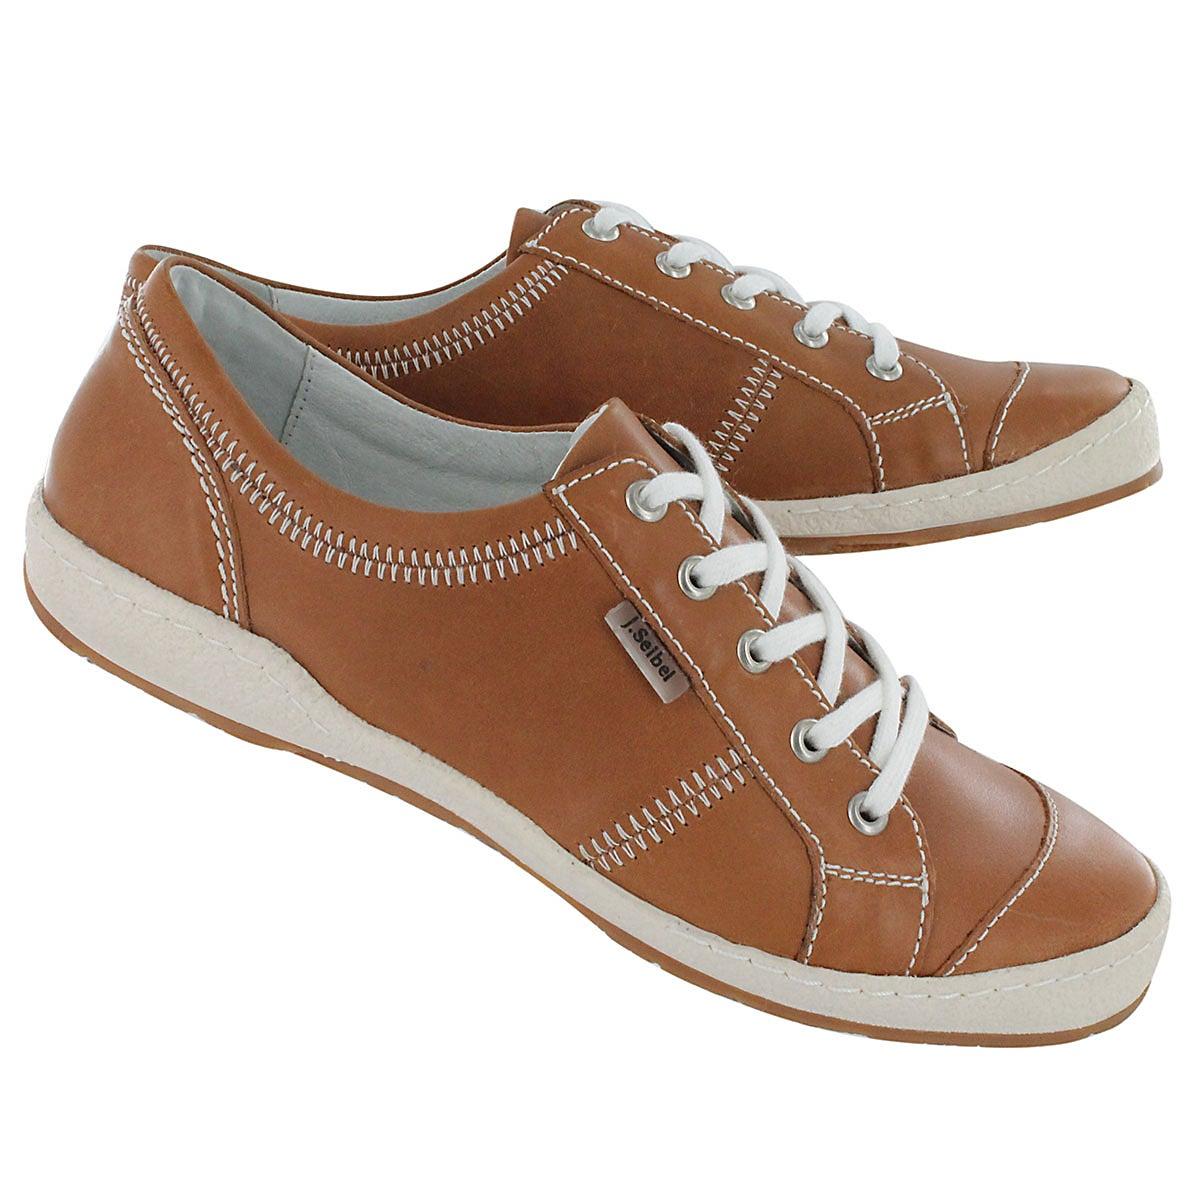 Lds New Caspian tan lace shoe